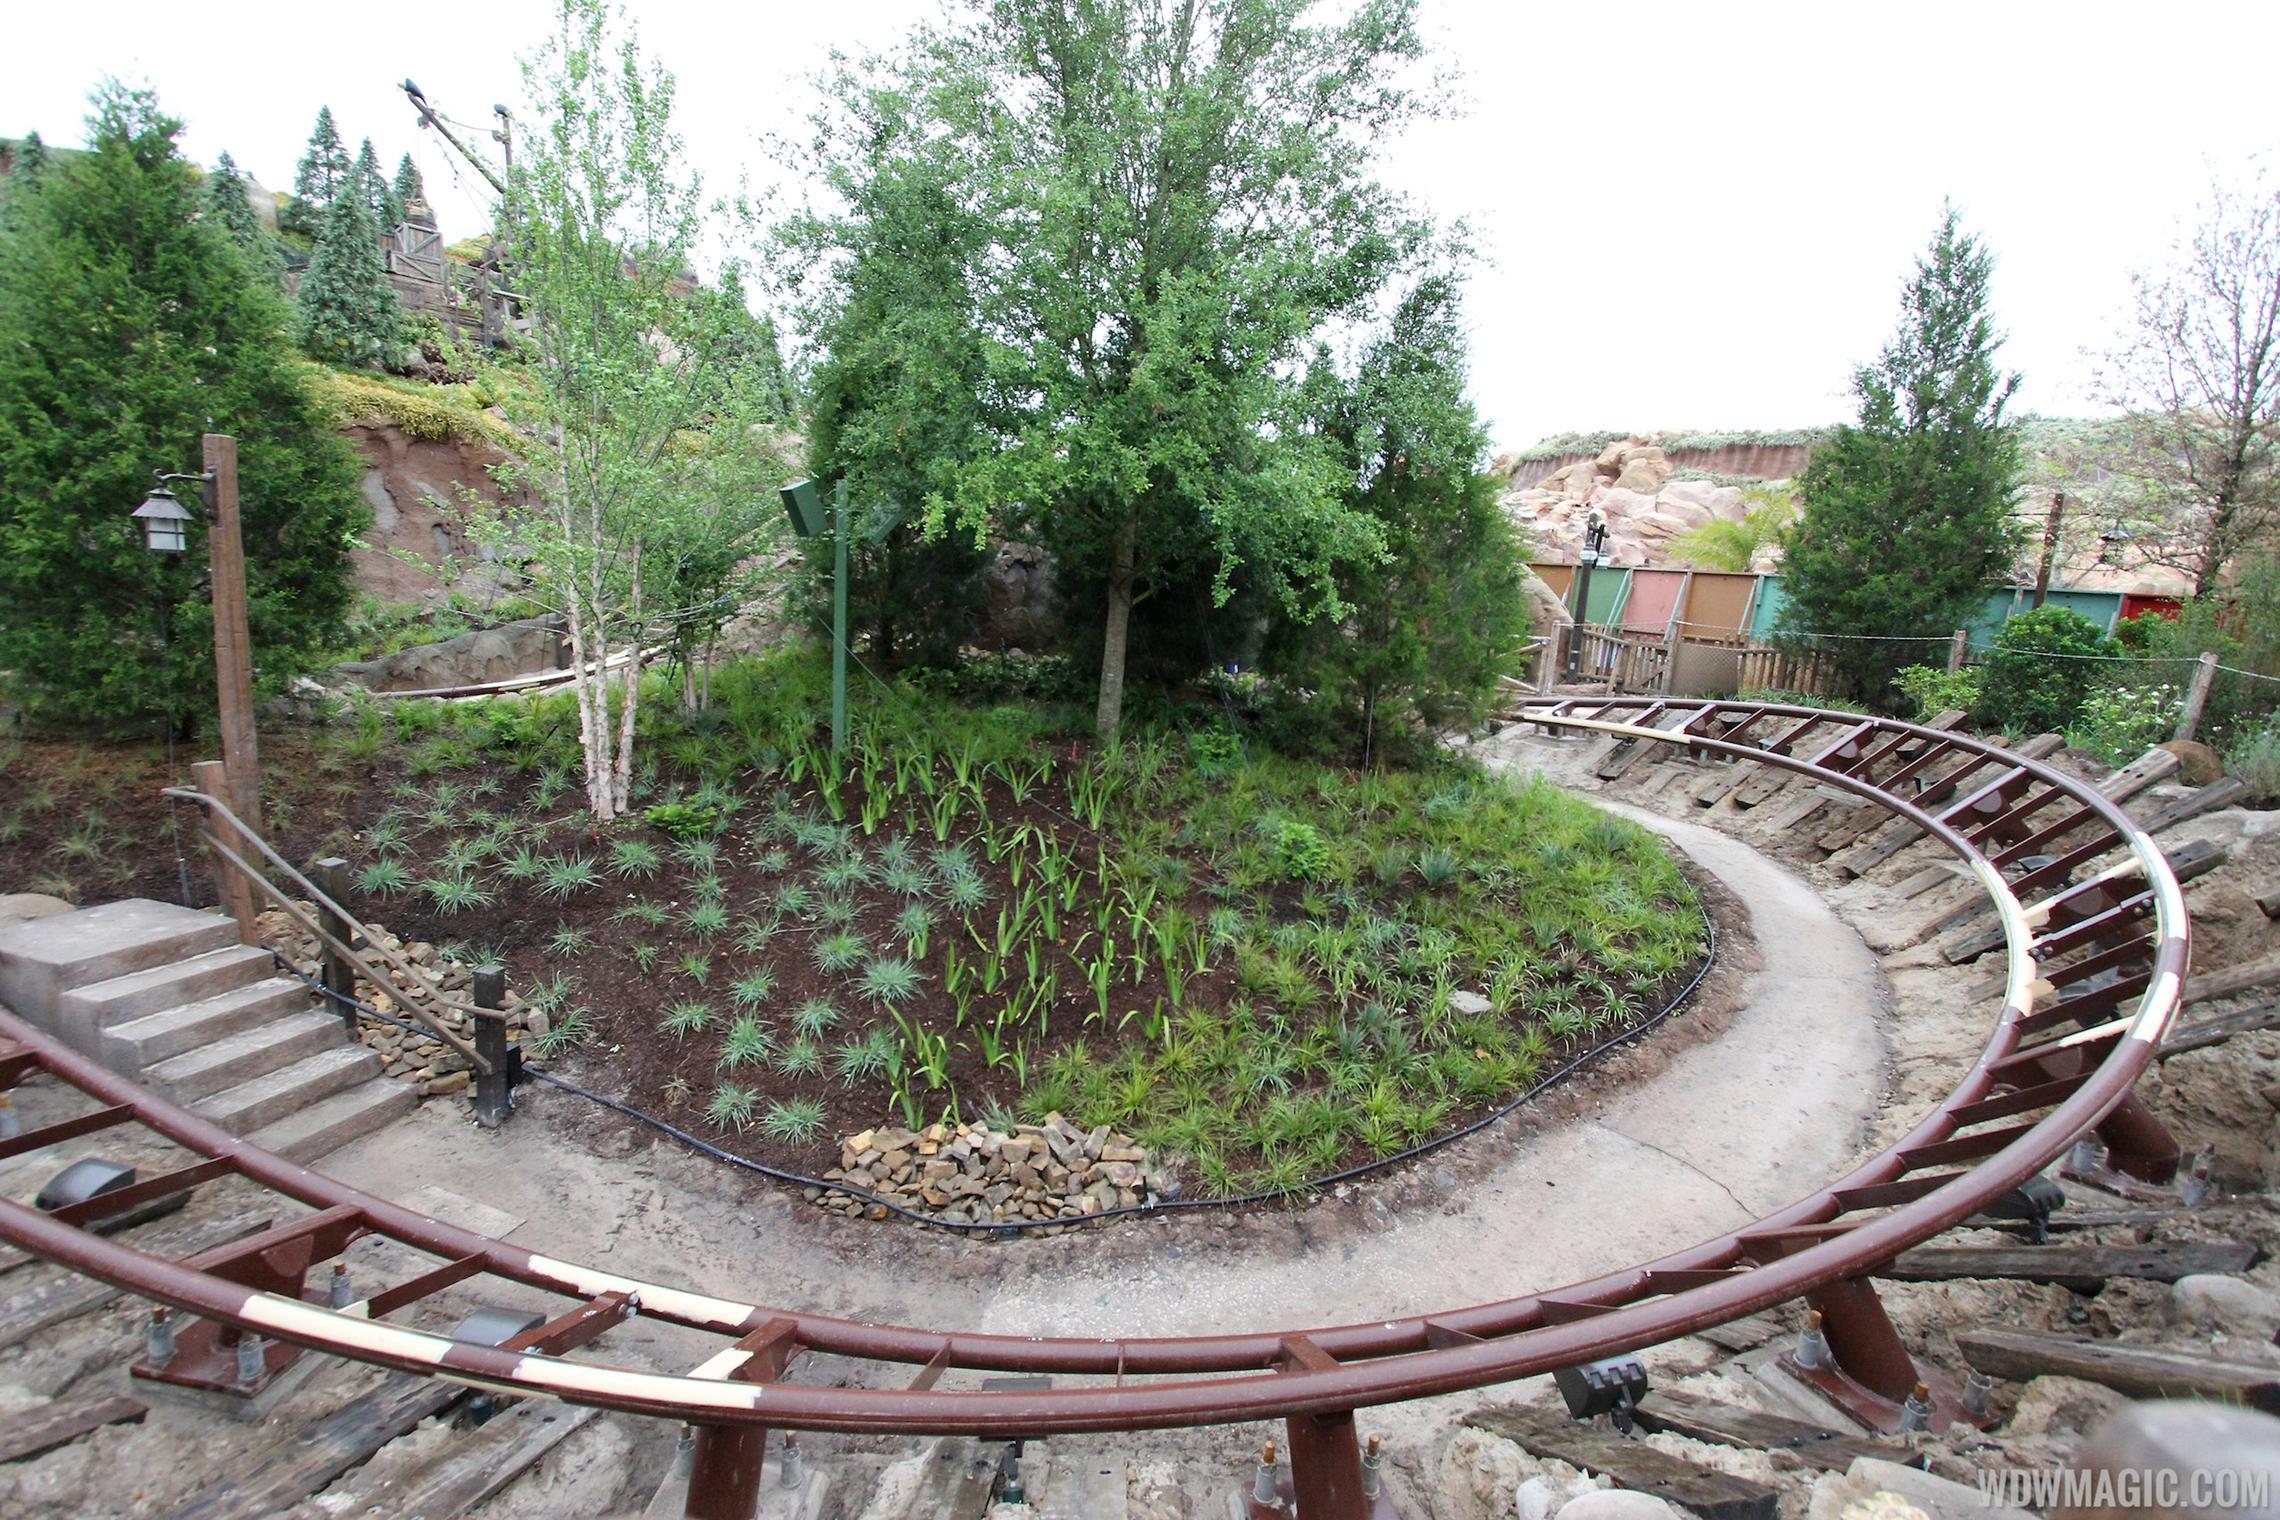 More walls down at Seven Dwarfs Mine Train coaster